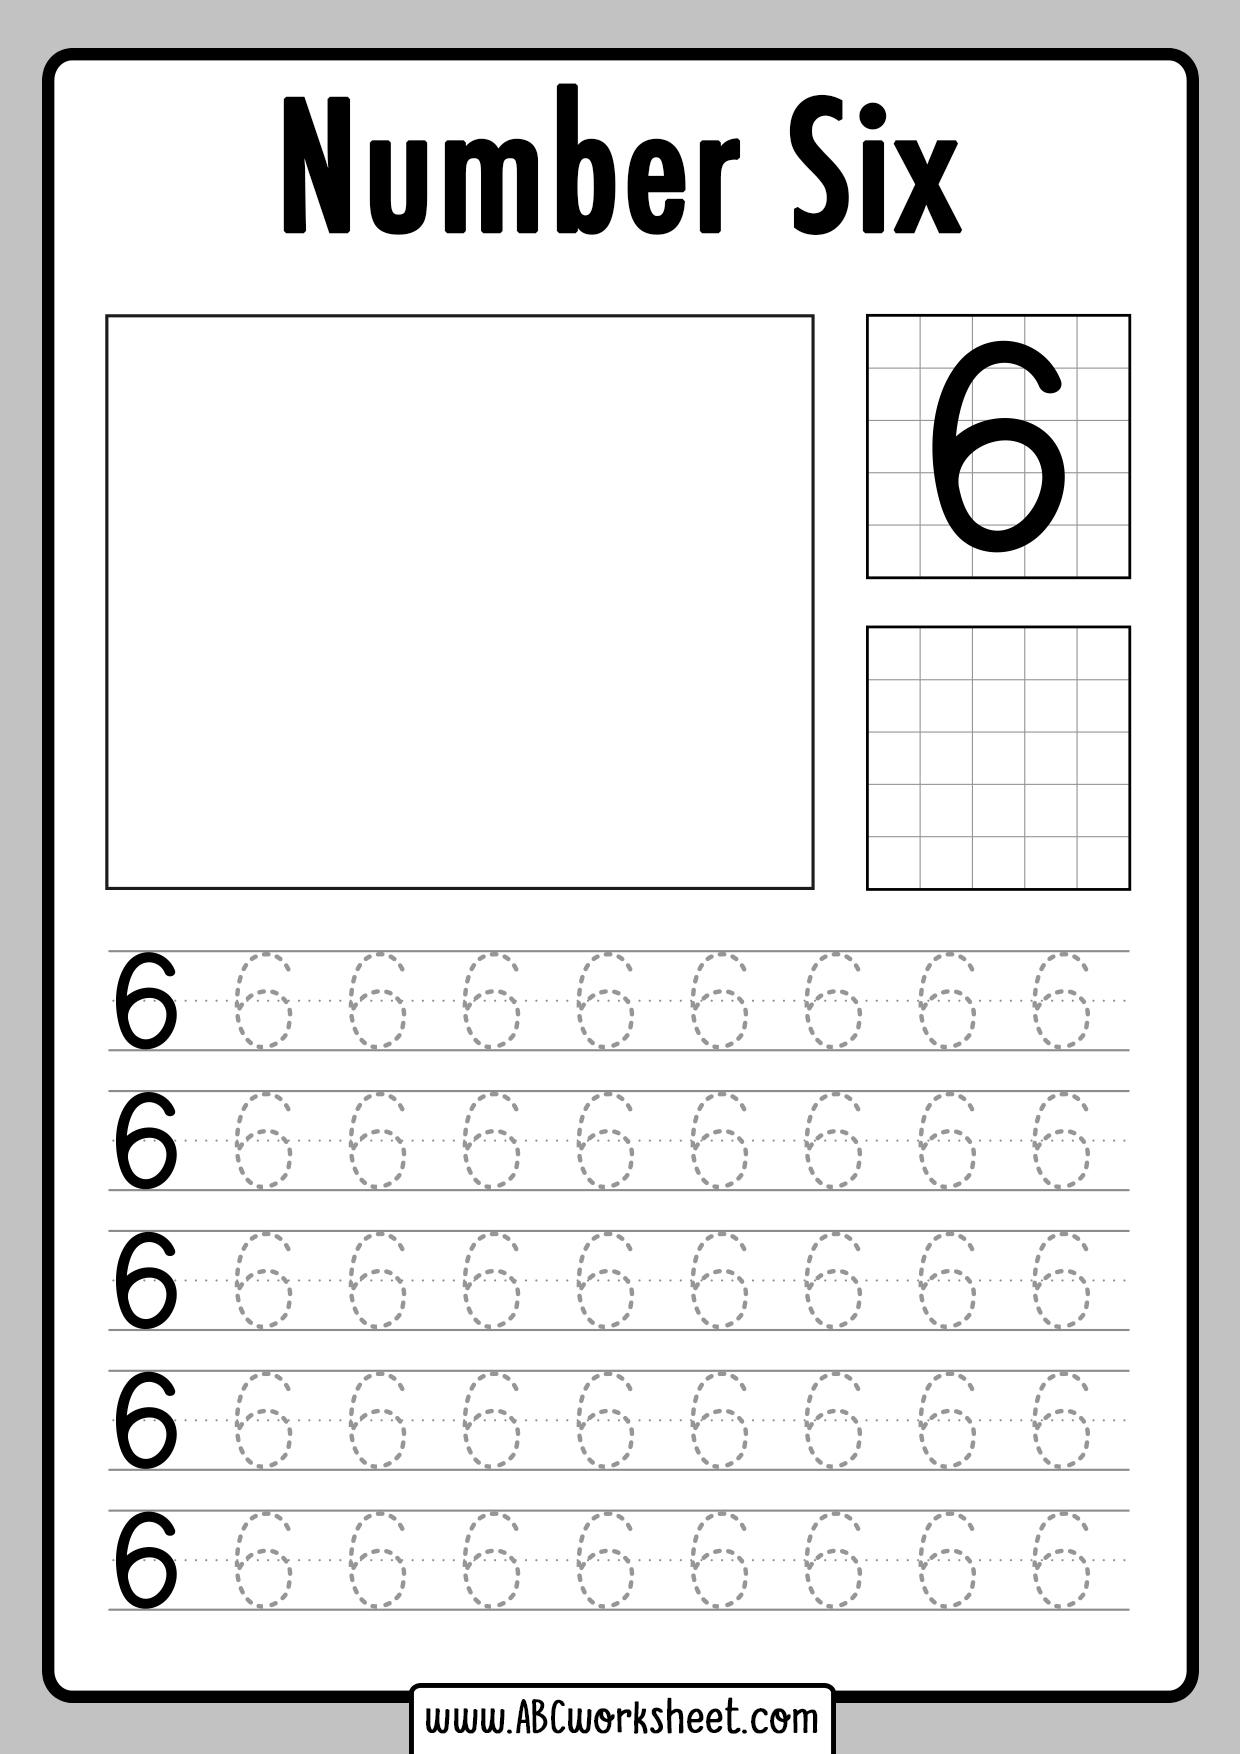 Tracing Number 6 Worksheet